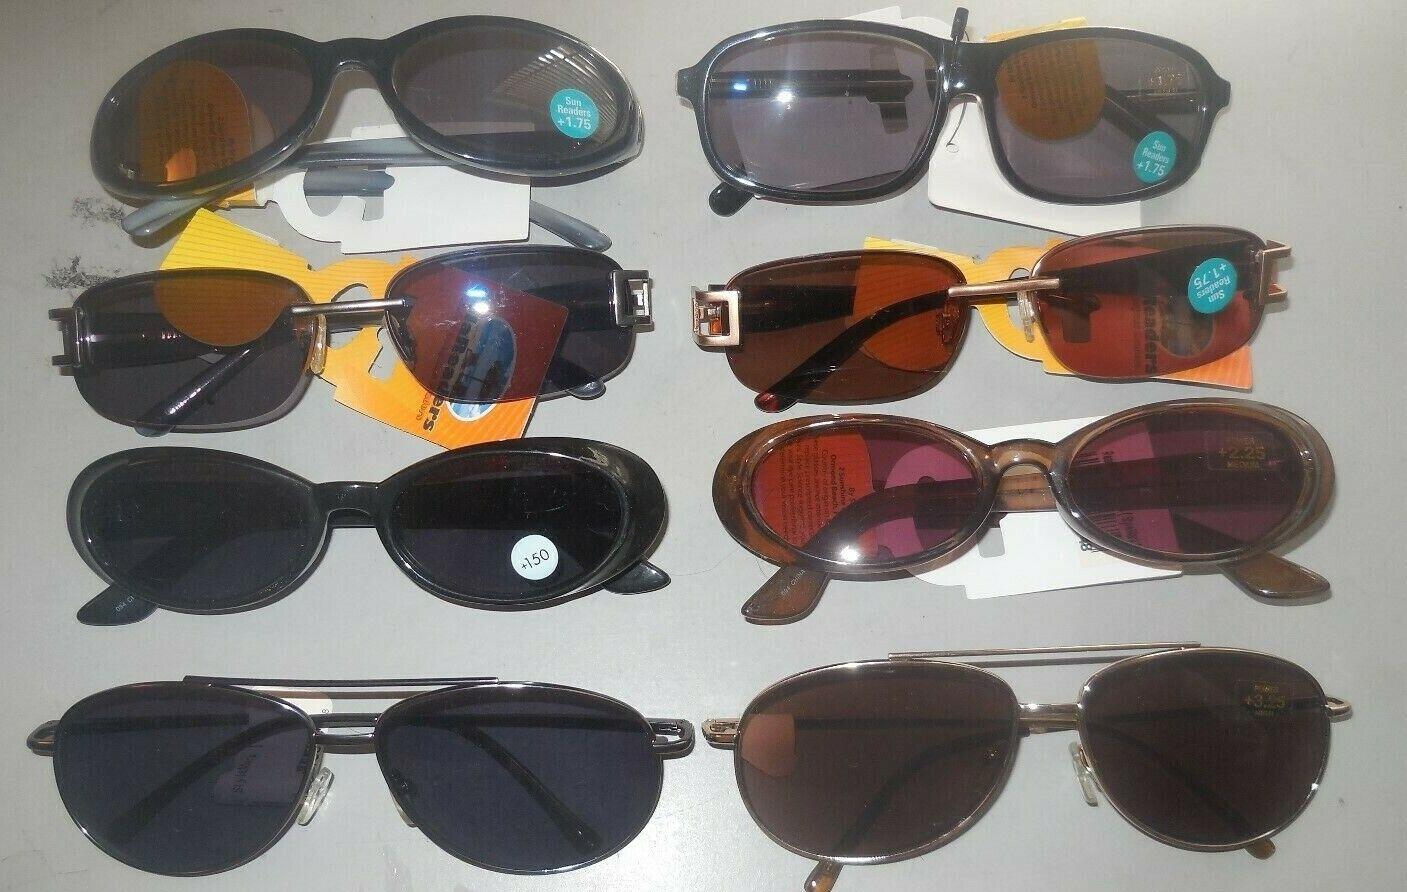 1 Sunglasses SunReaders Style Science / Personal Optics SolaReaders Sun Readers